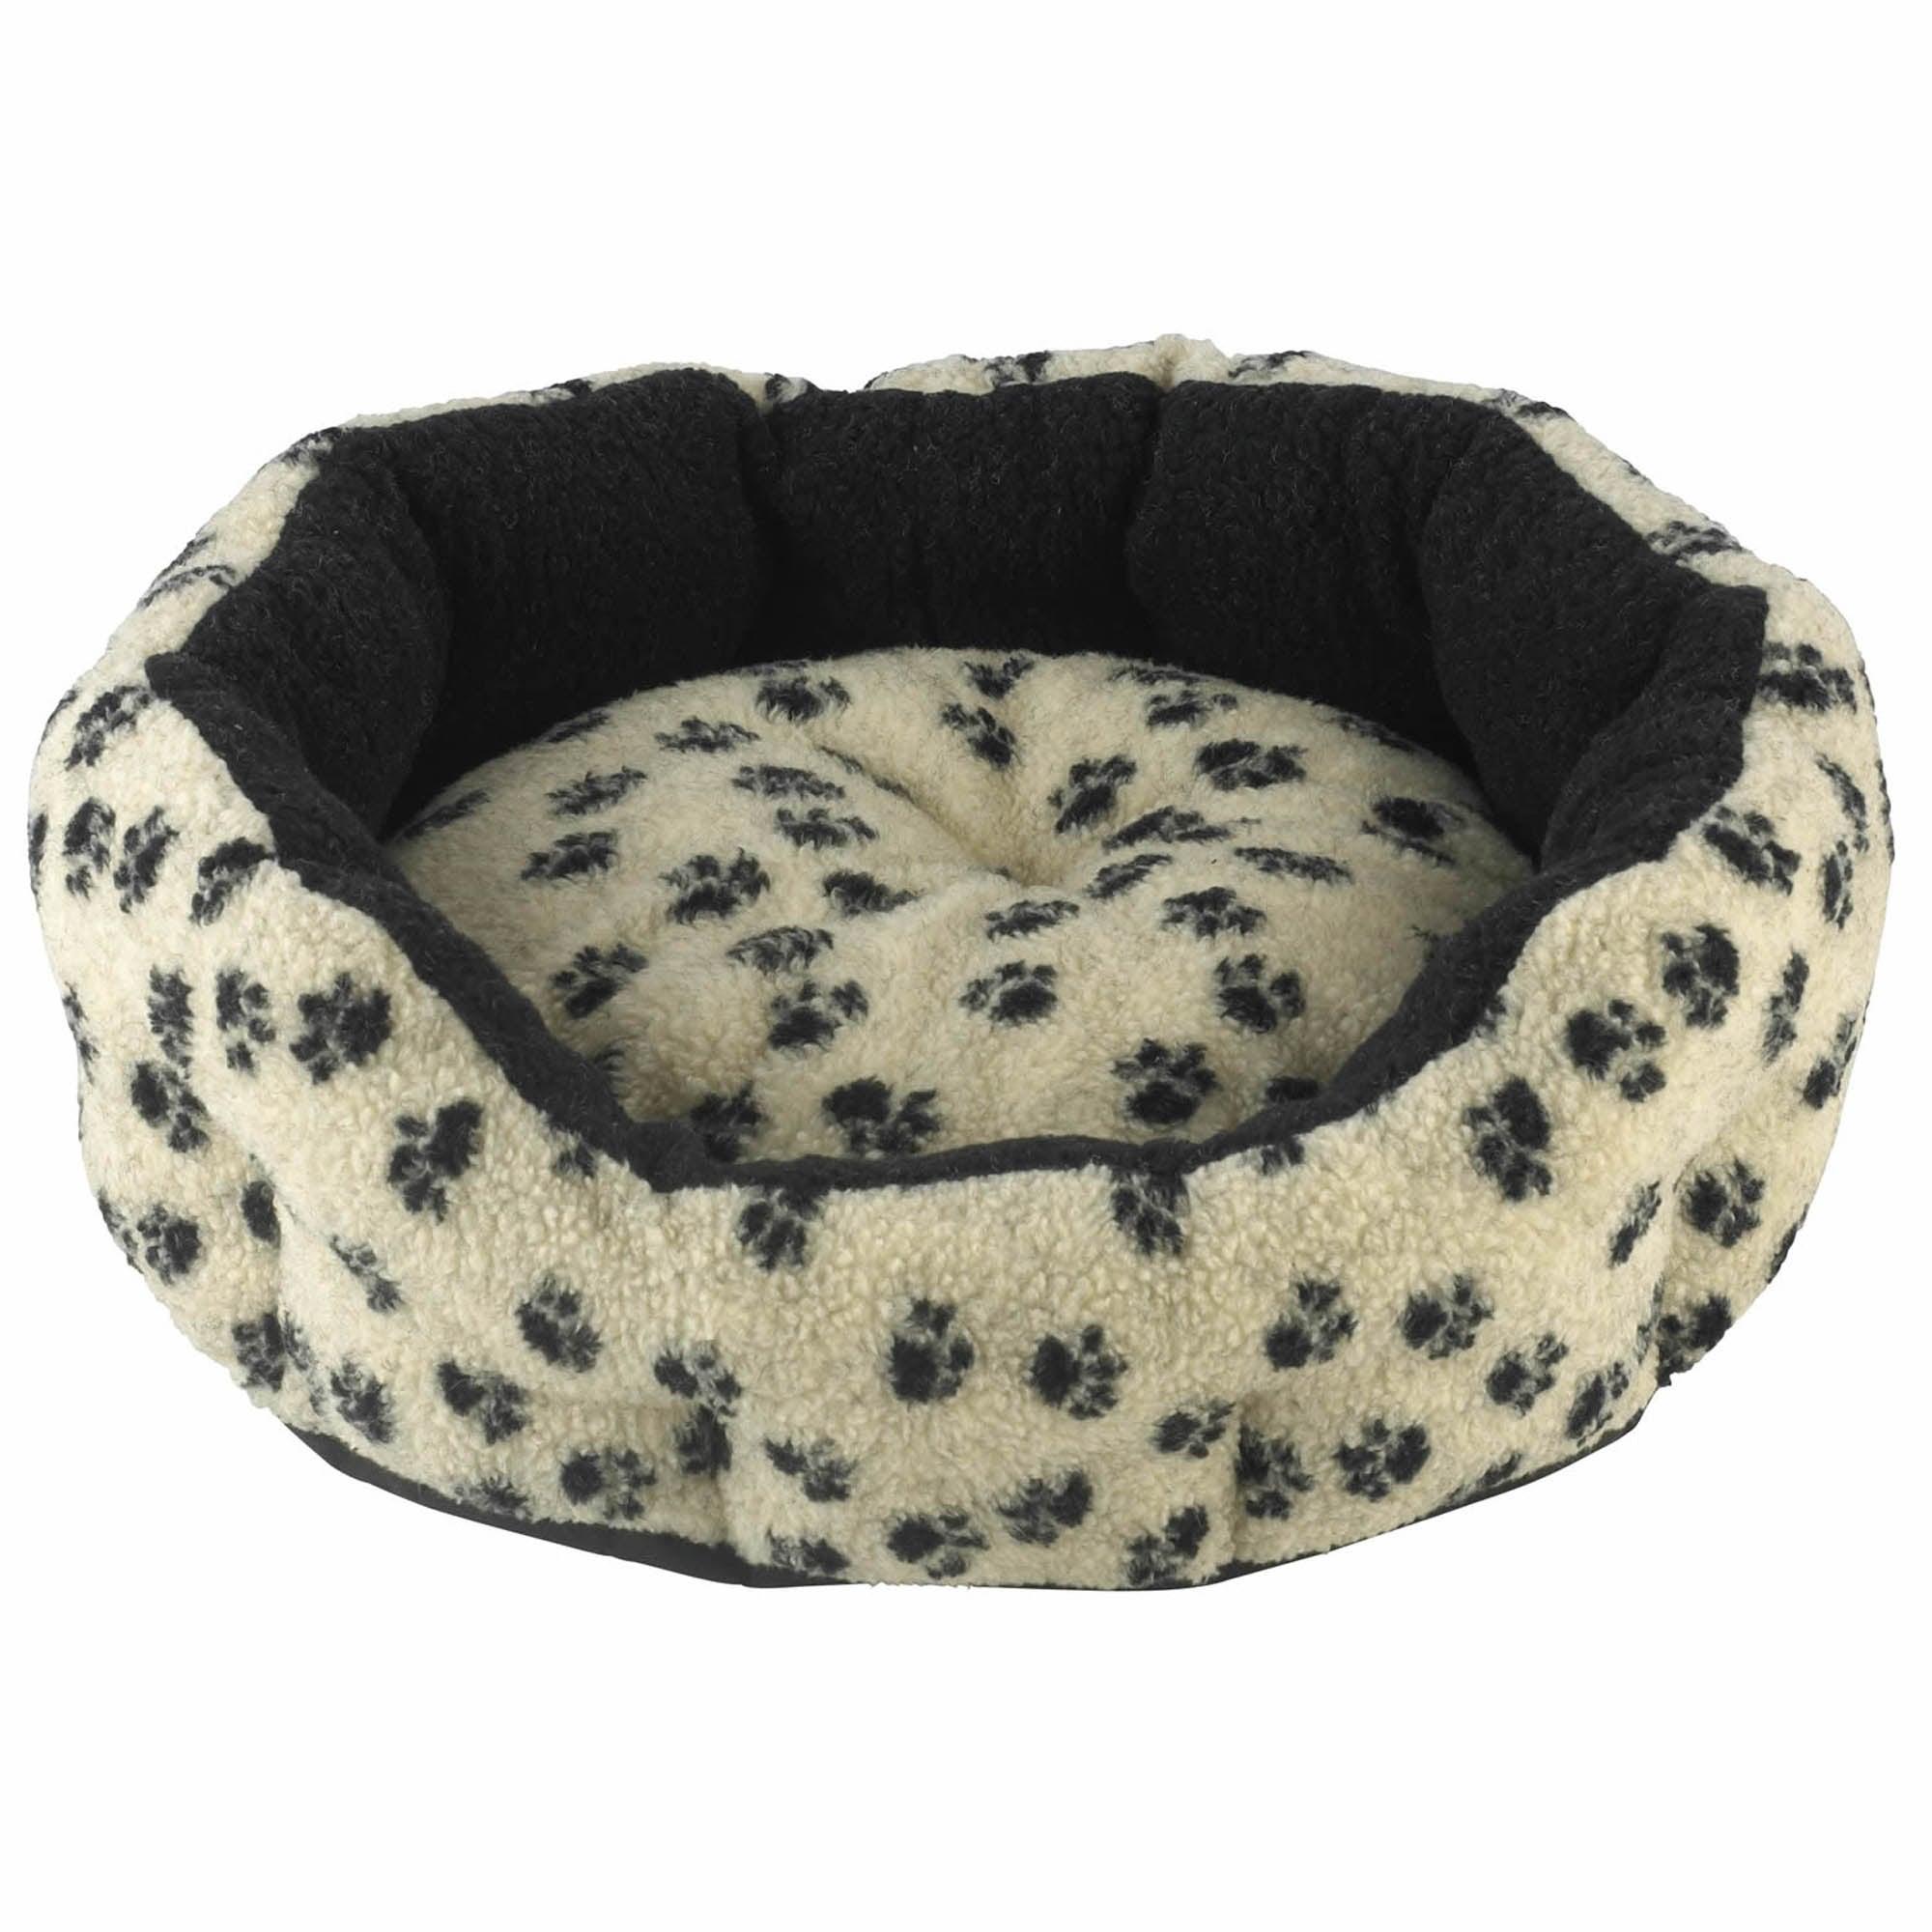 Cream Oval Dog Bed Cream (Natural)